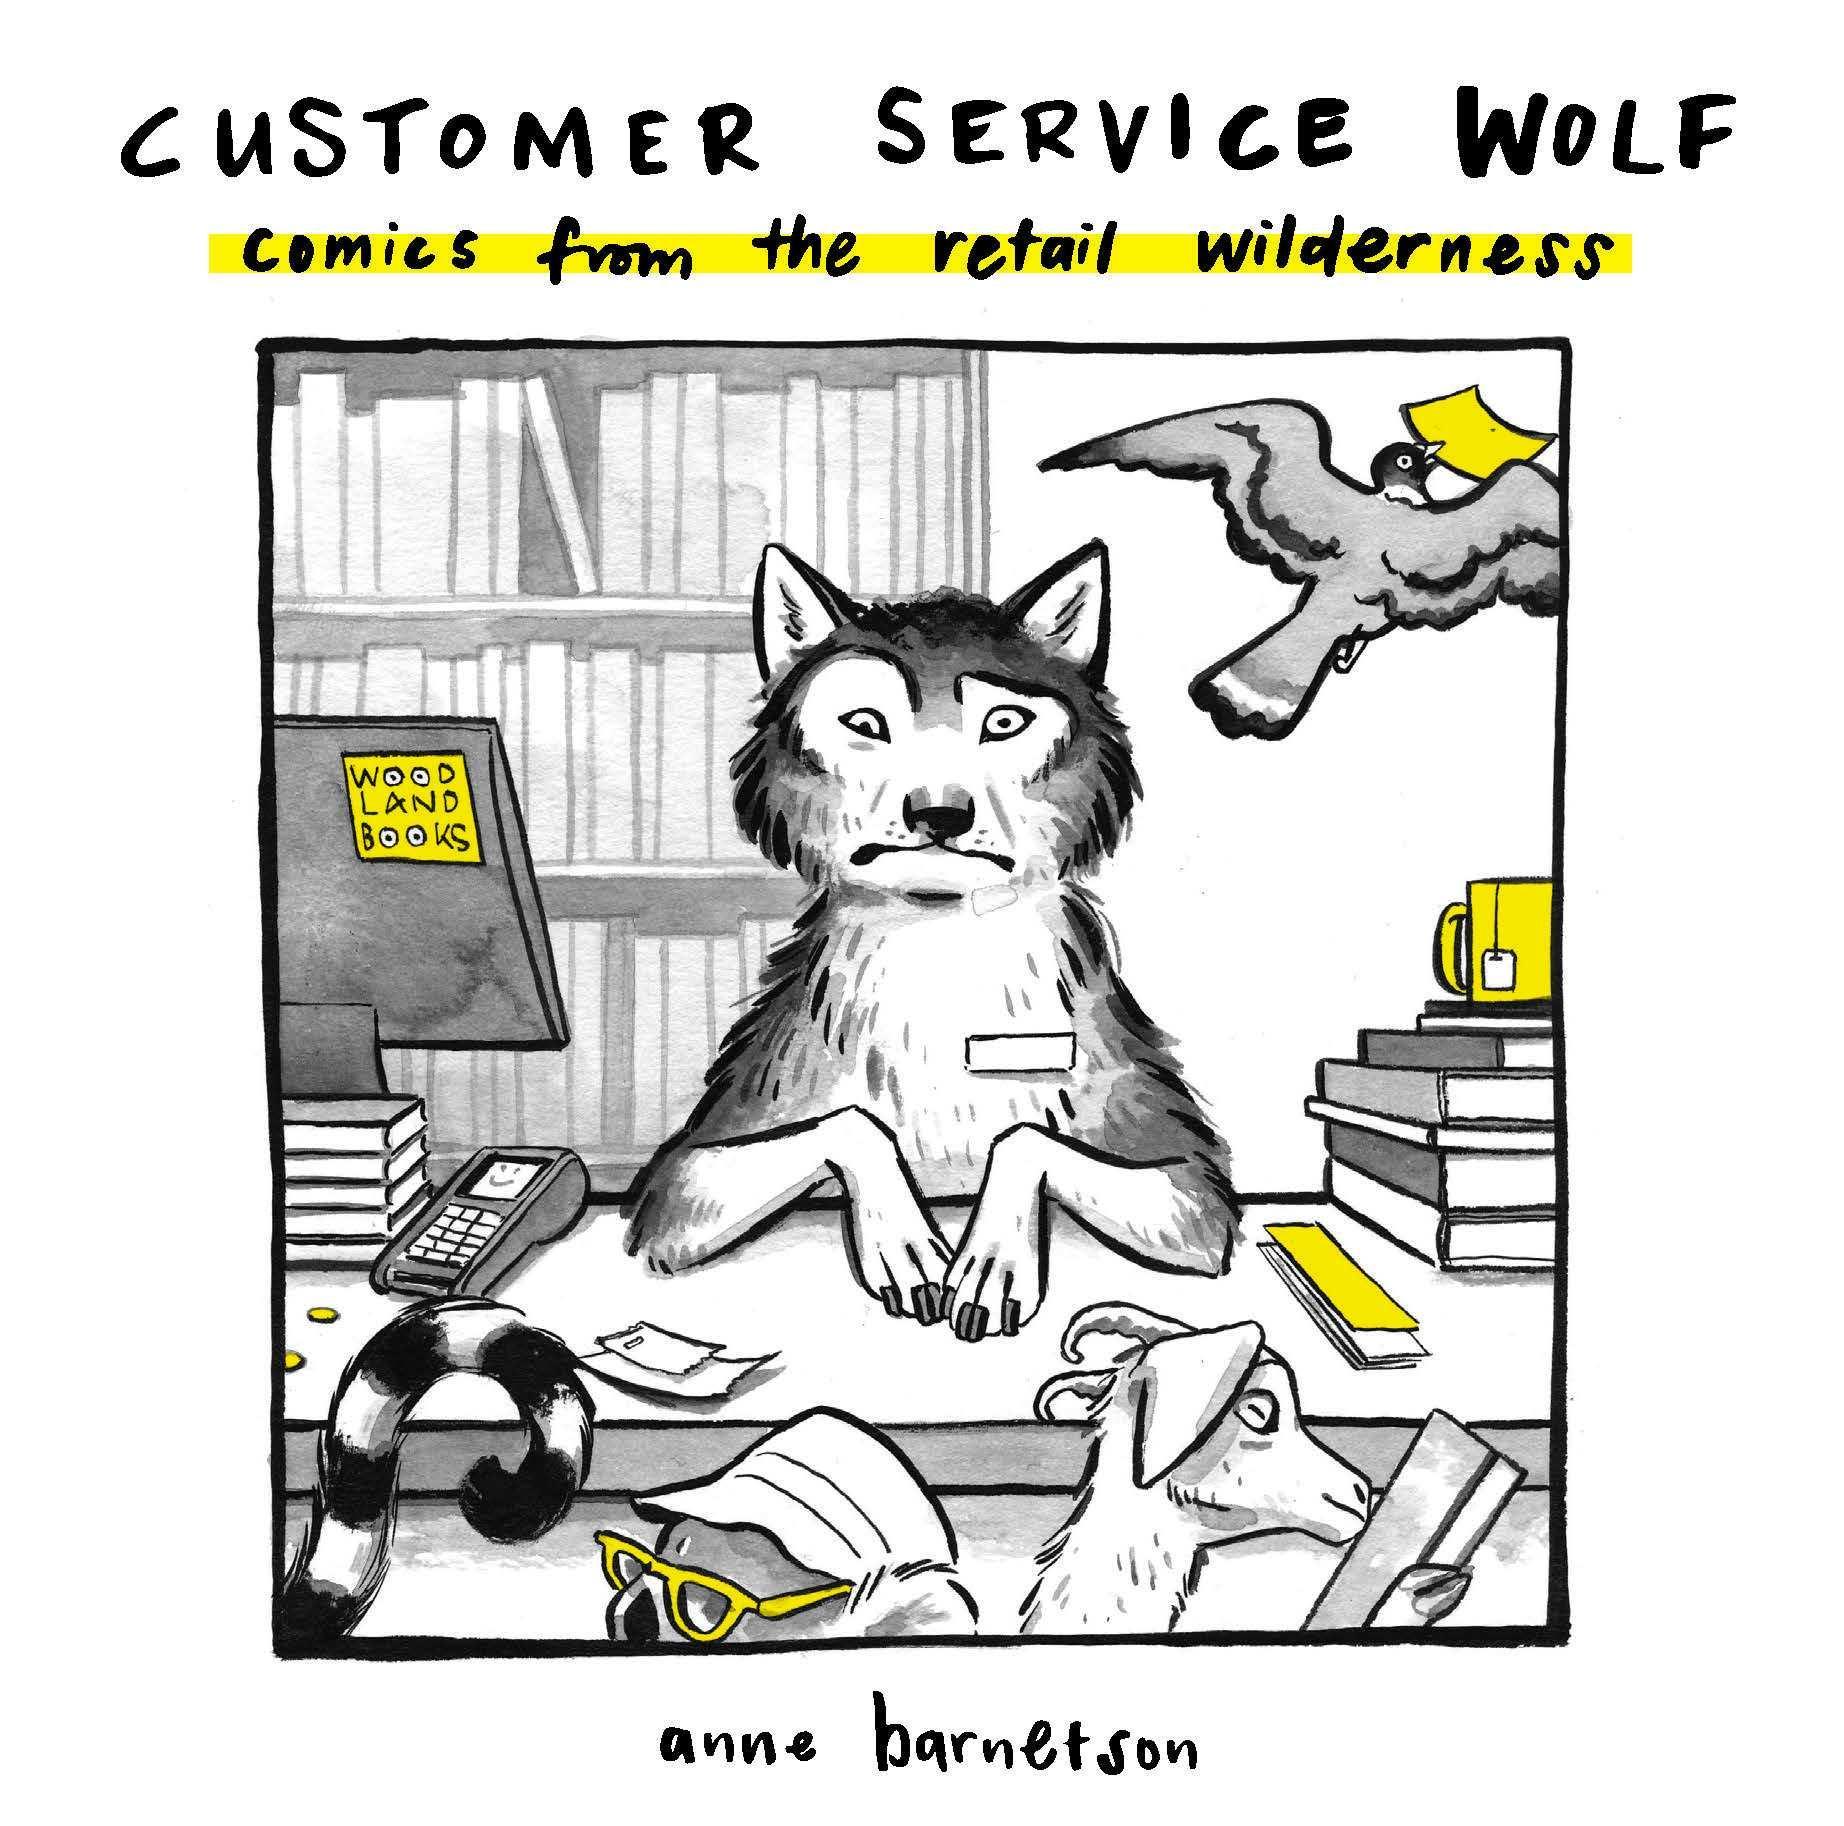 CustomerServiceWolf